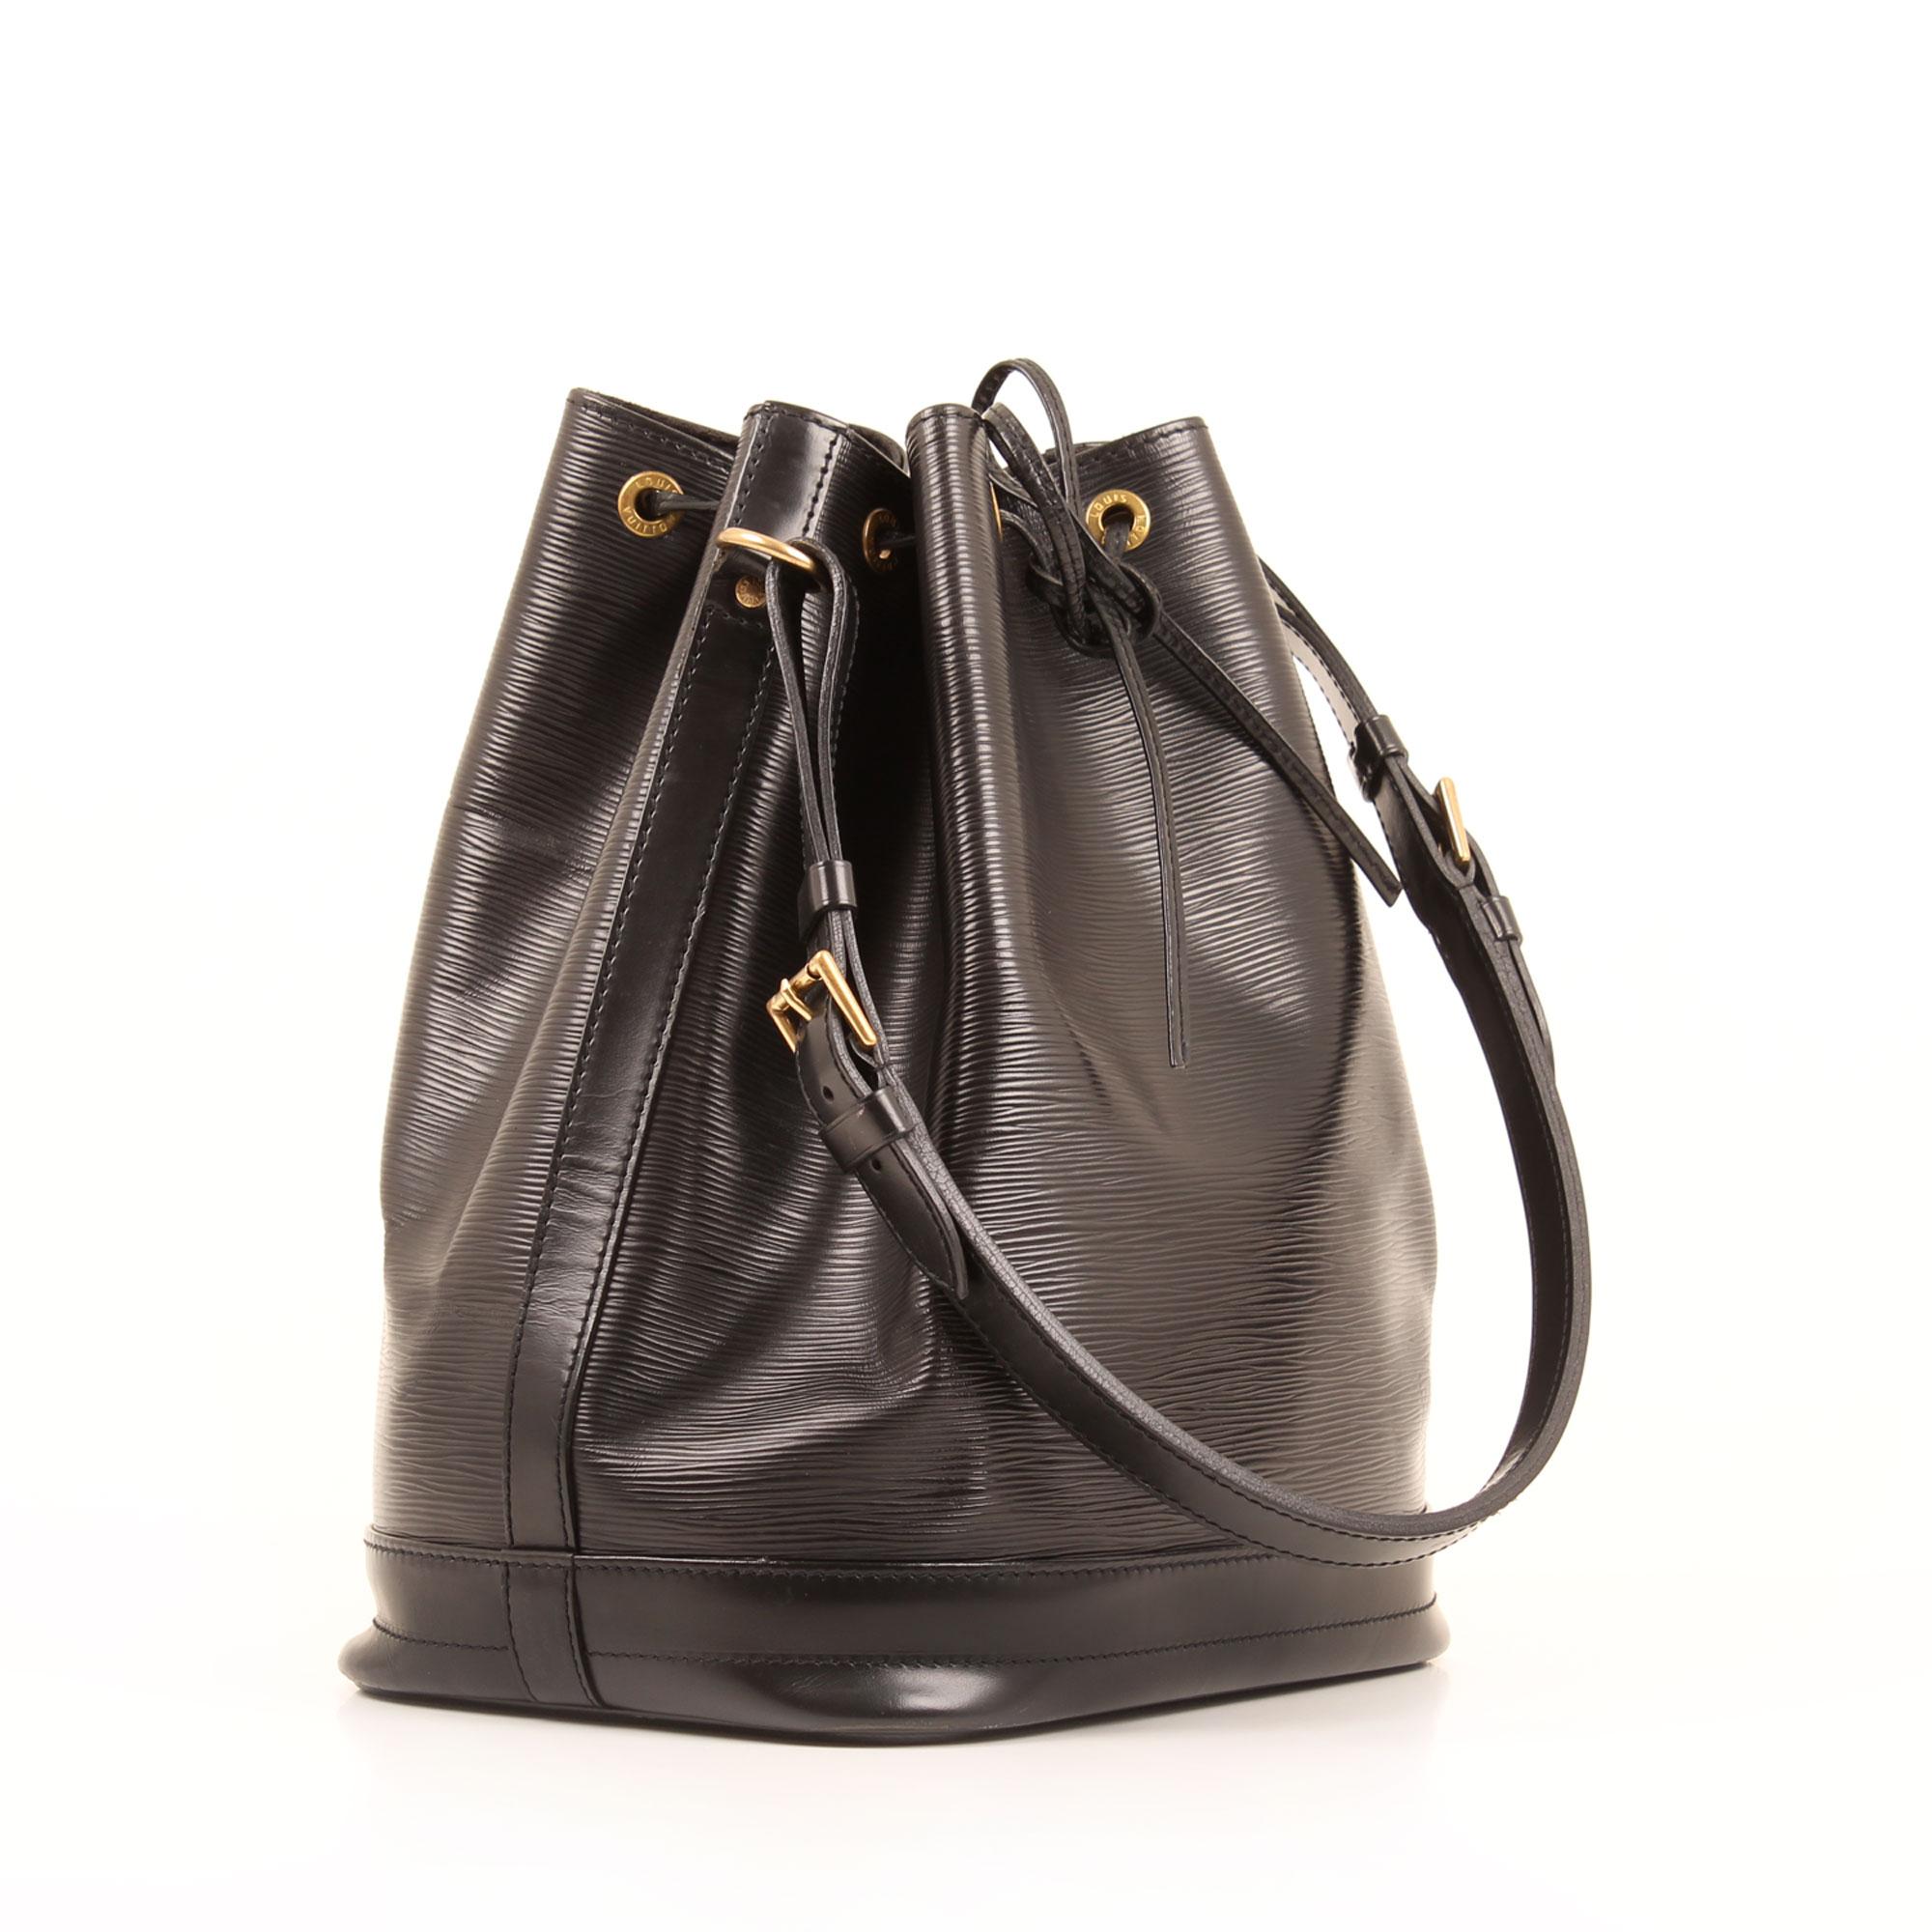 General image of louis vuitton noe black epi leather bag